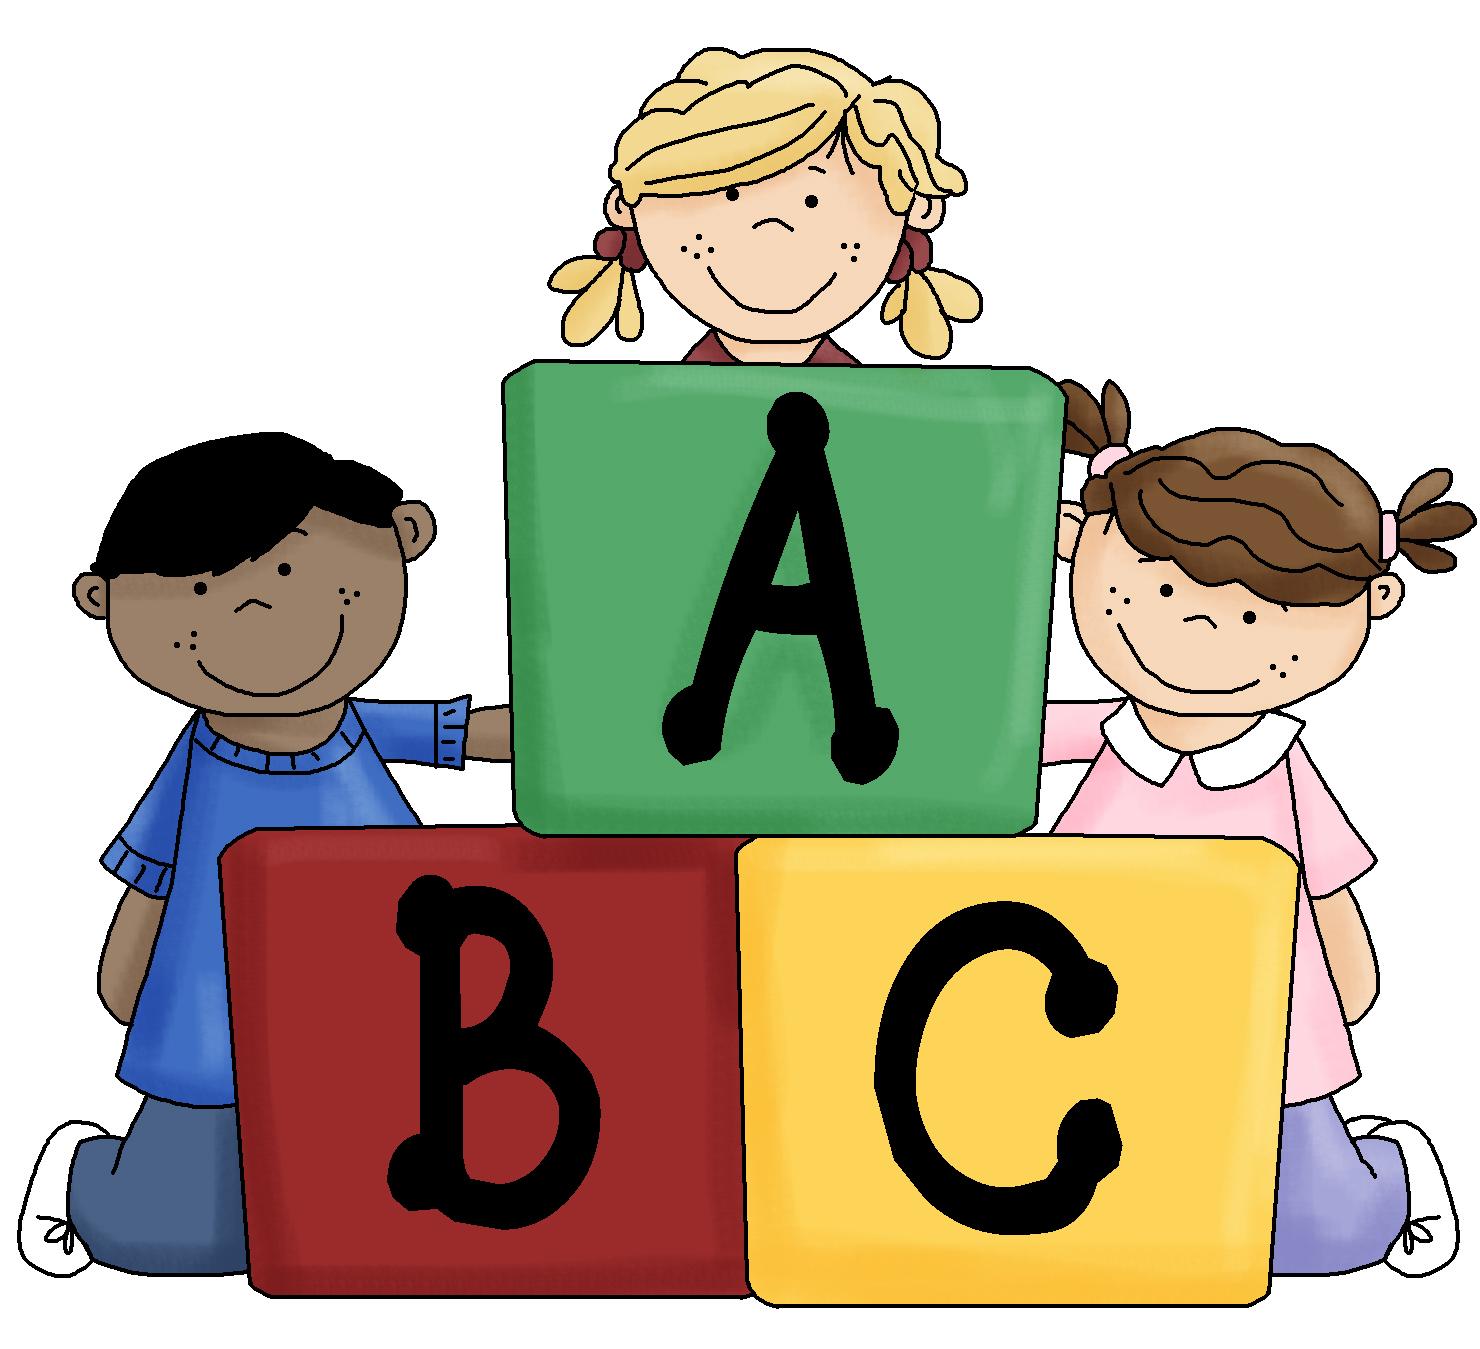 Abc blocks kid clipartix. Block clipart cute